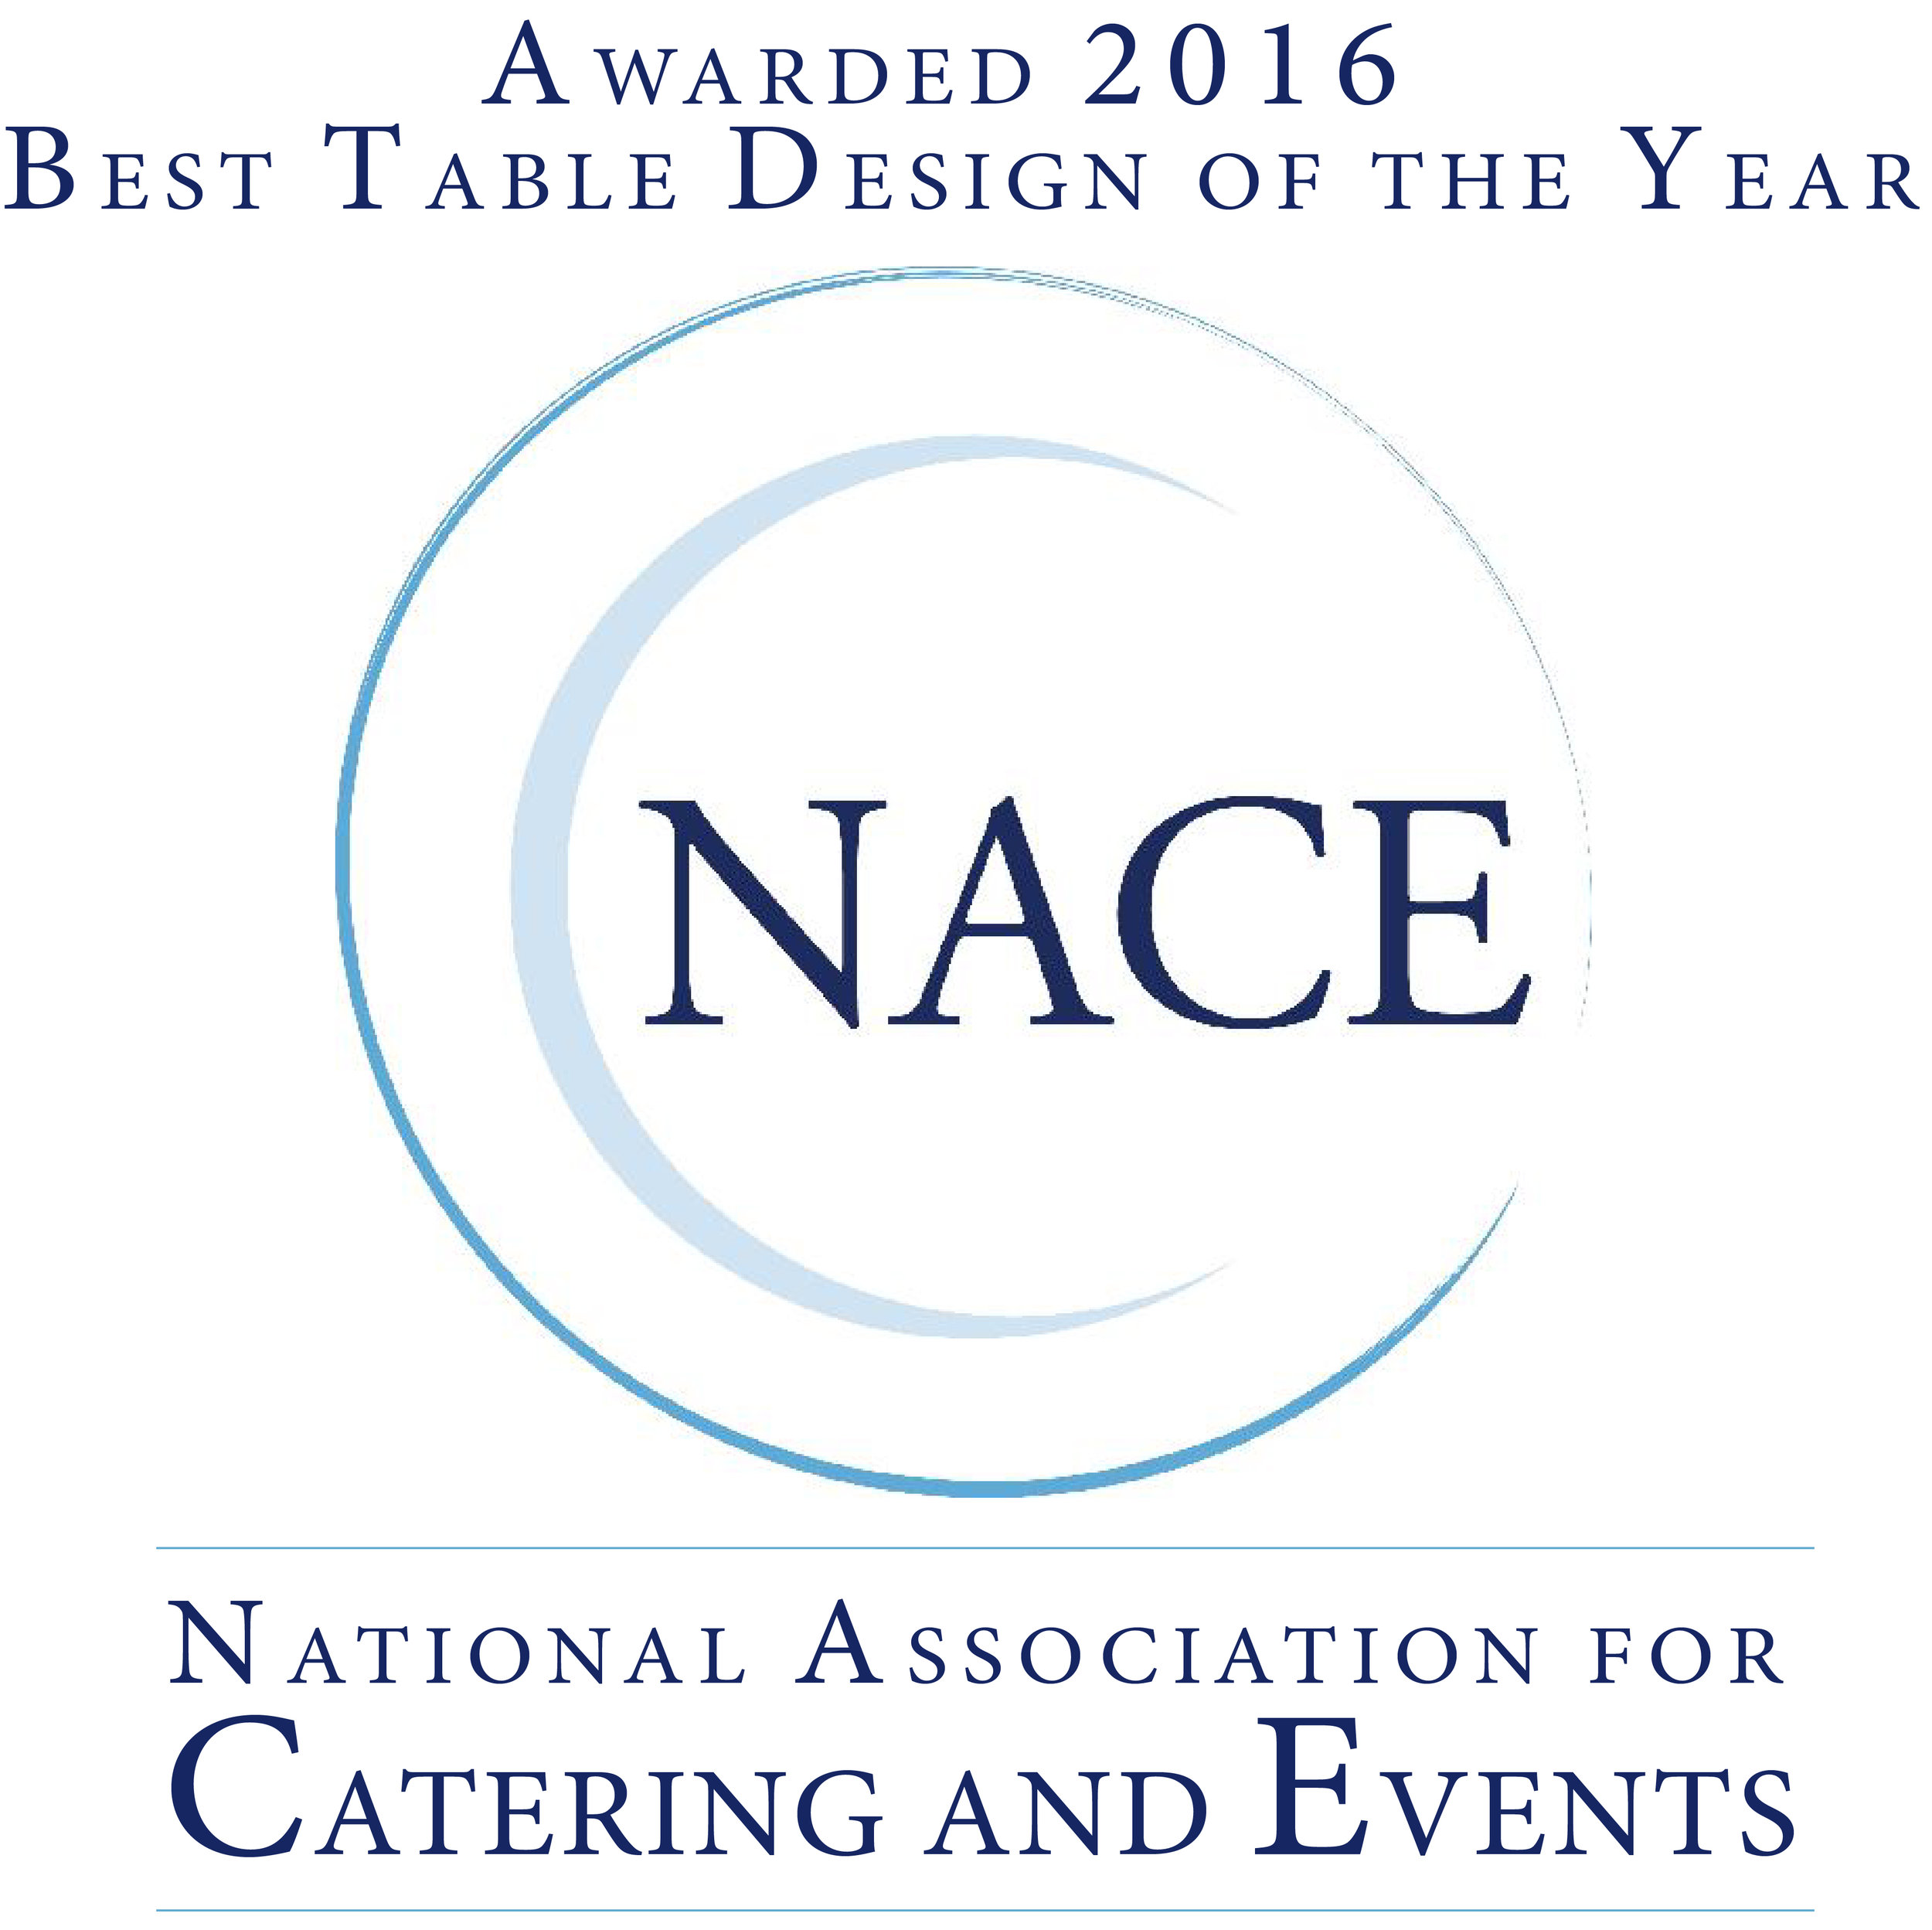 NACE Logo_National Award Winner_2016a.jpg